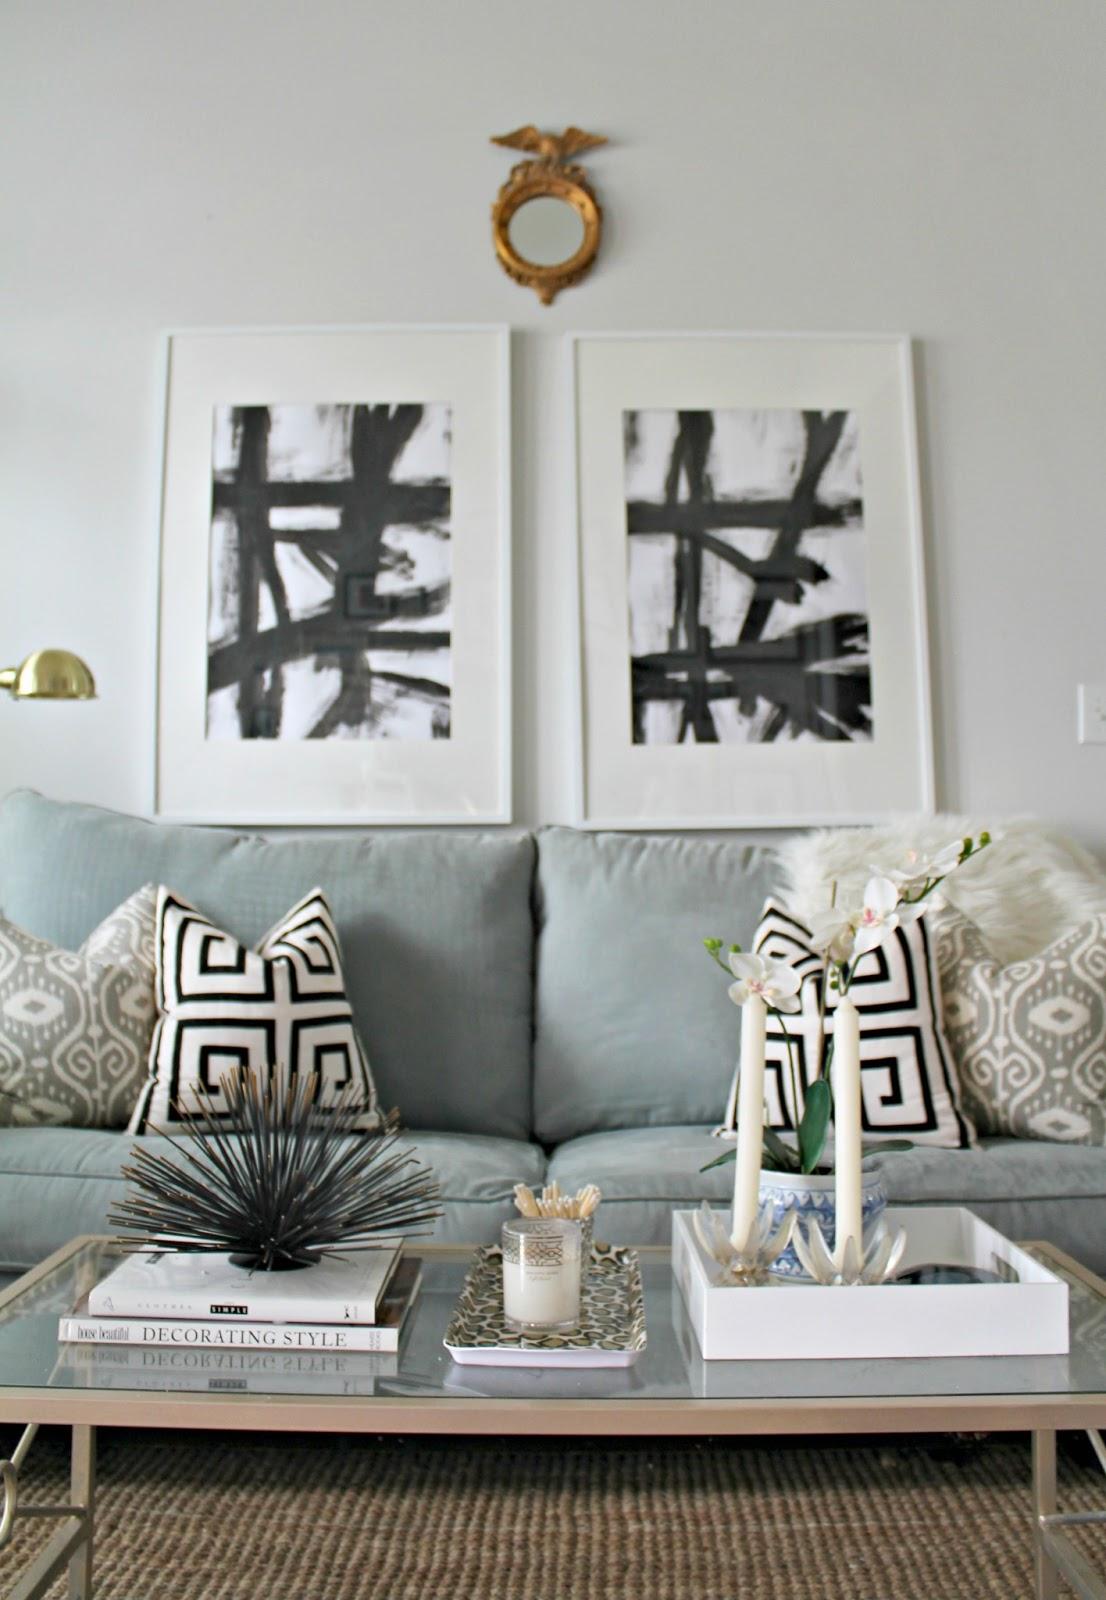 Diy Knock Off Shelves: DIY Knock-off West Elm Abstract Art